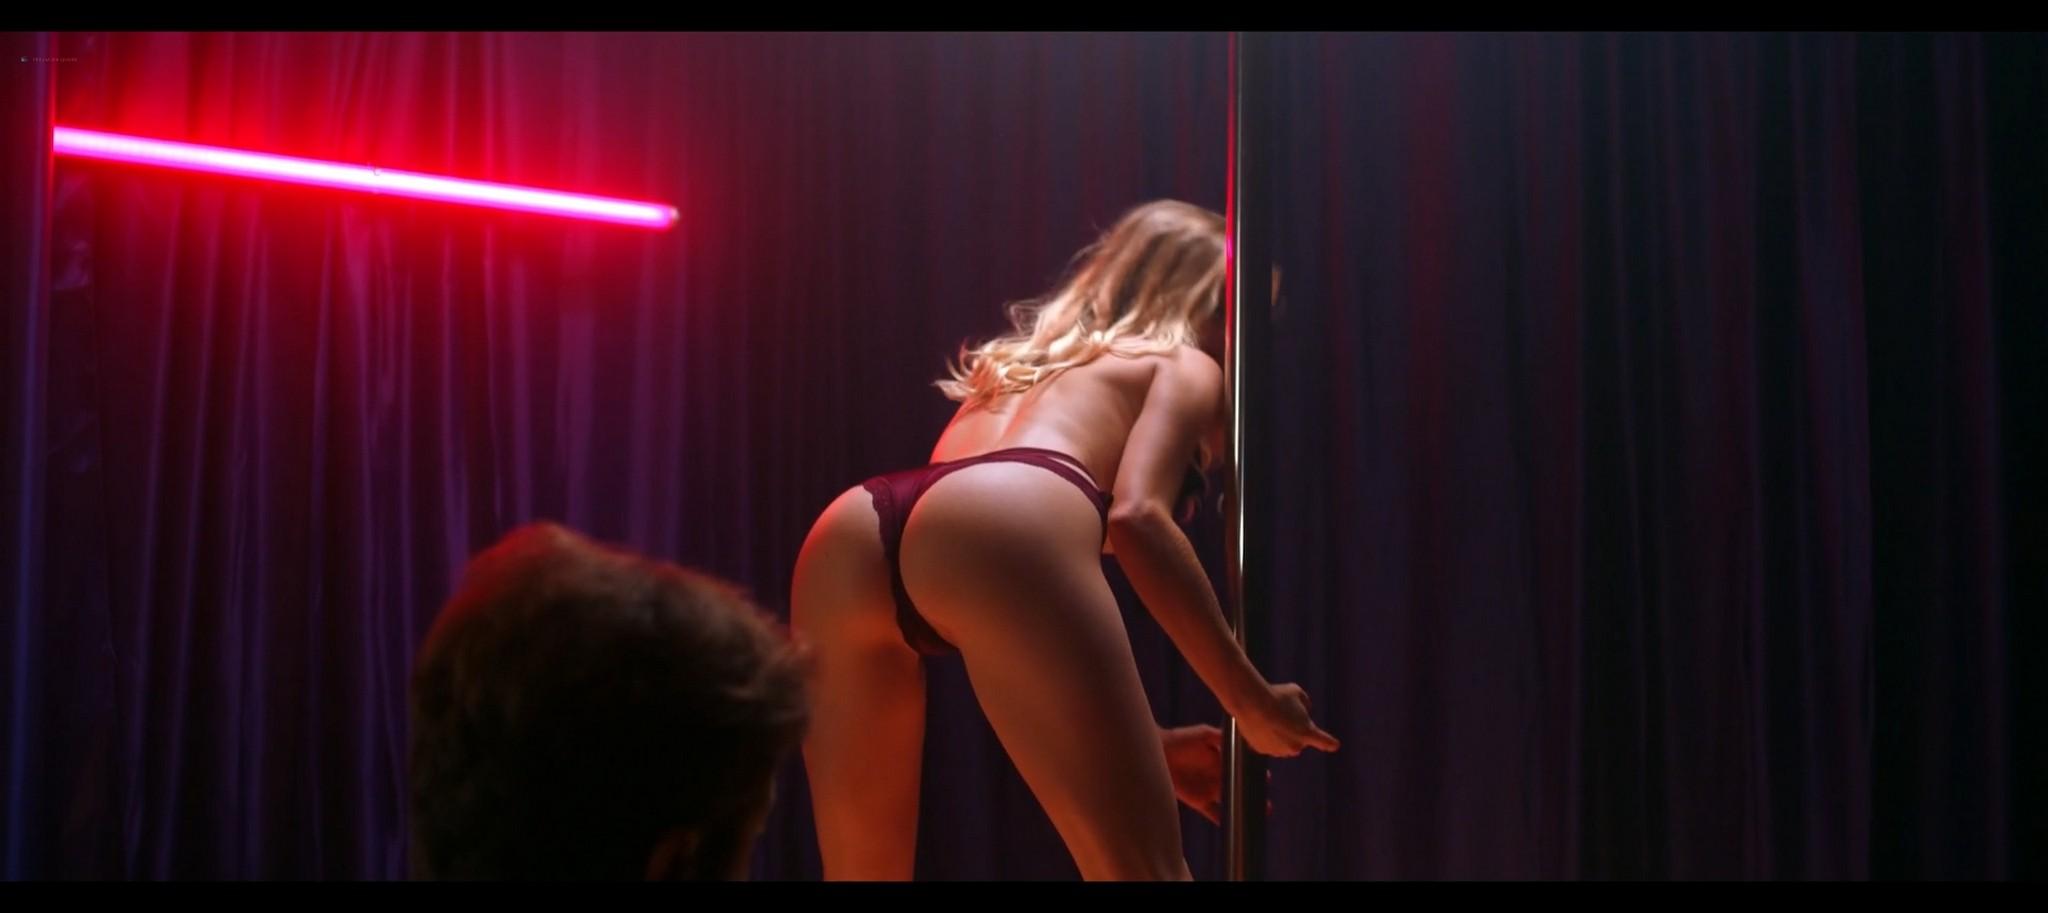 Kenzie Dalton hot Drue Knapp Ava Locklear sexy A Dark Foe 2021 1080p Web 16